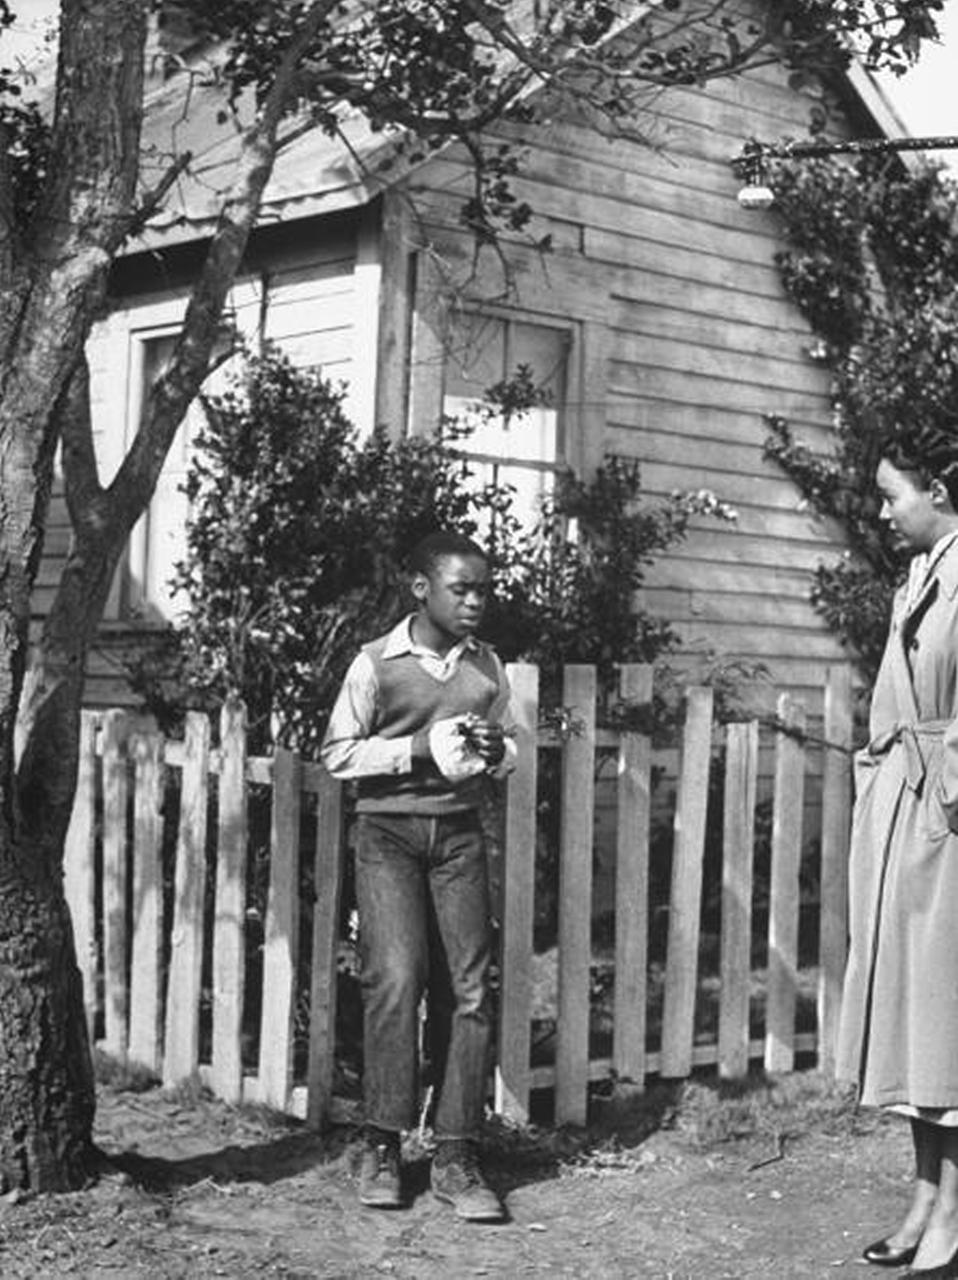 Harry belafonte 1953 movie